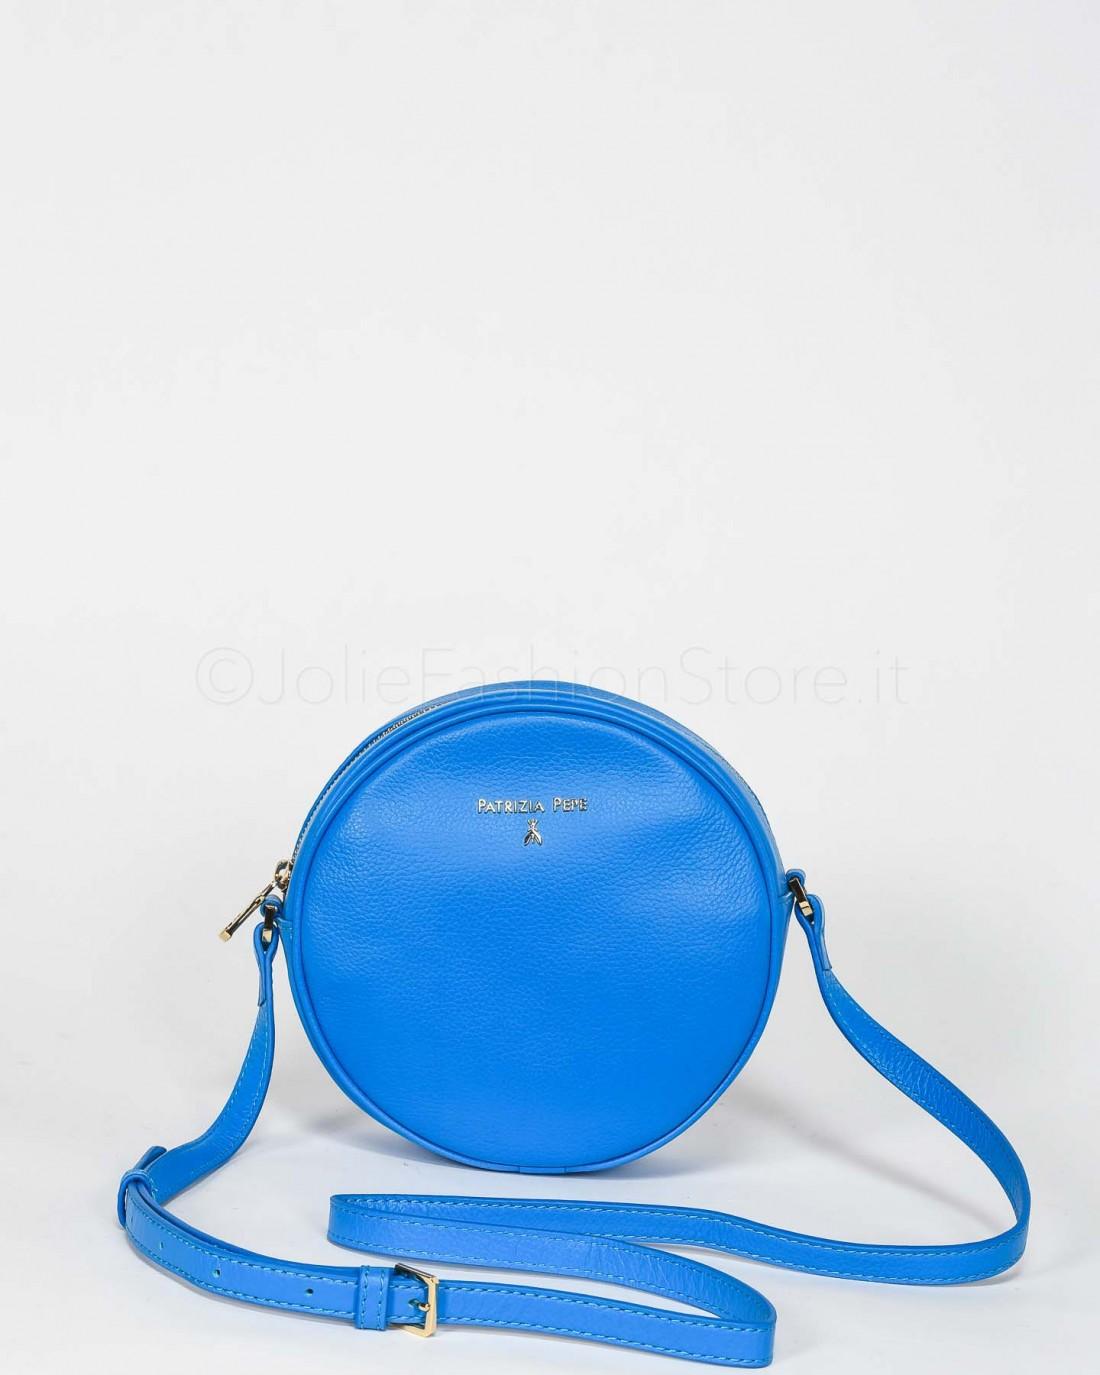 Patrizia Pepe Borsa Astral Blue  2VA198A4U8N-C859